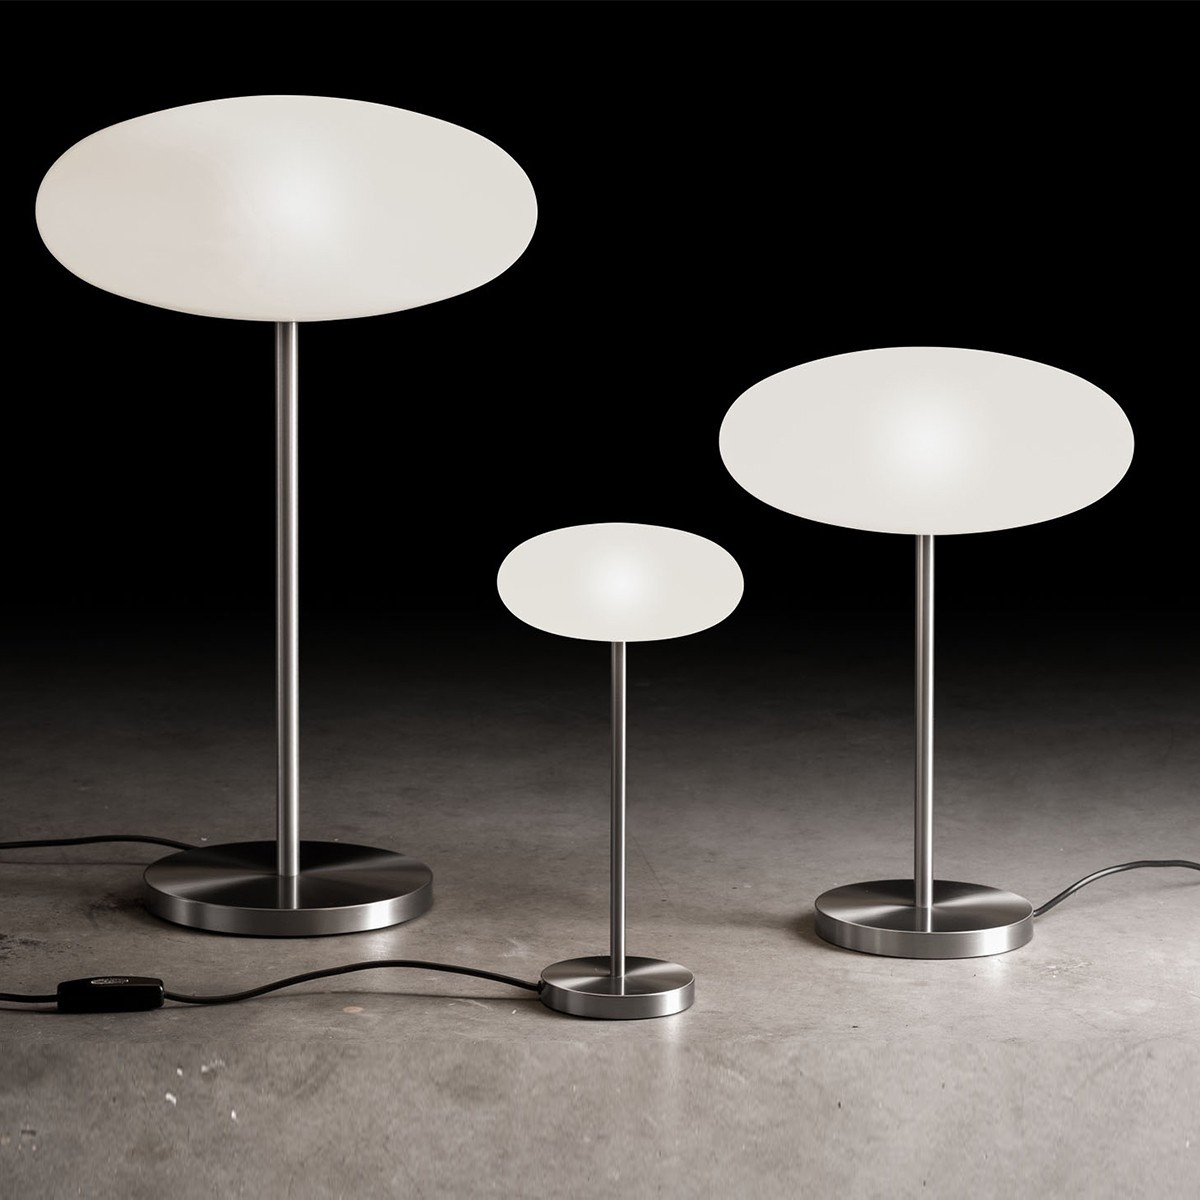 Holtkötter Leuchten Amor T Tischleuchte LED, Höhe: 69 cm, Nickel matt